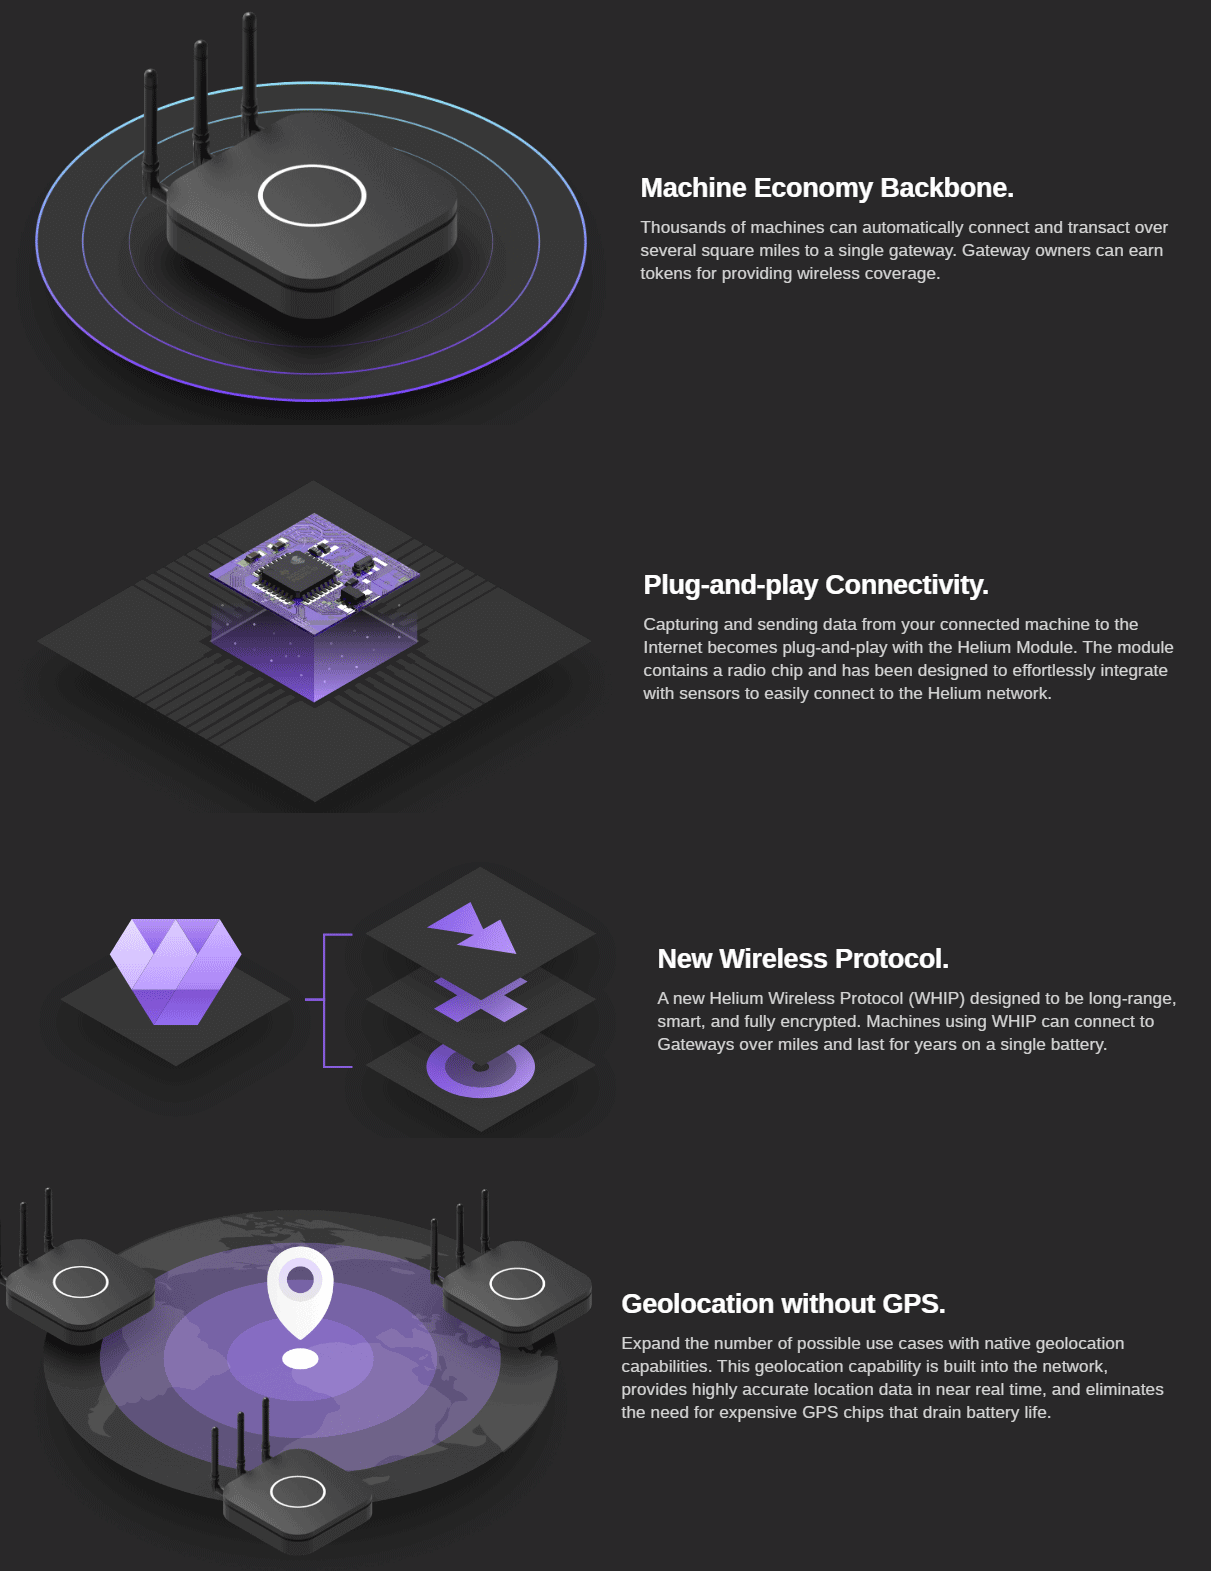 The Helium Network